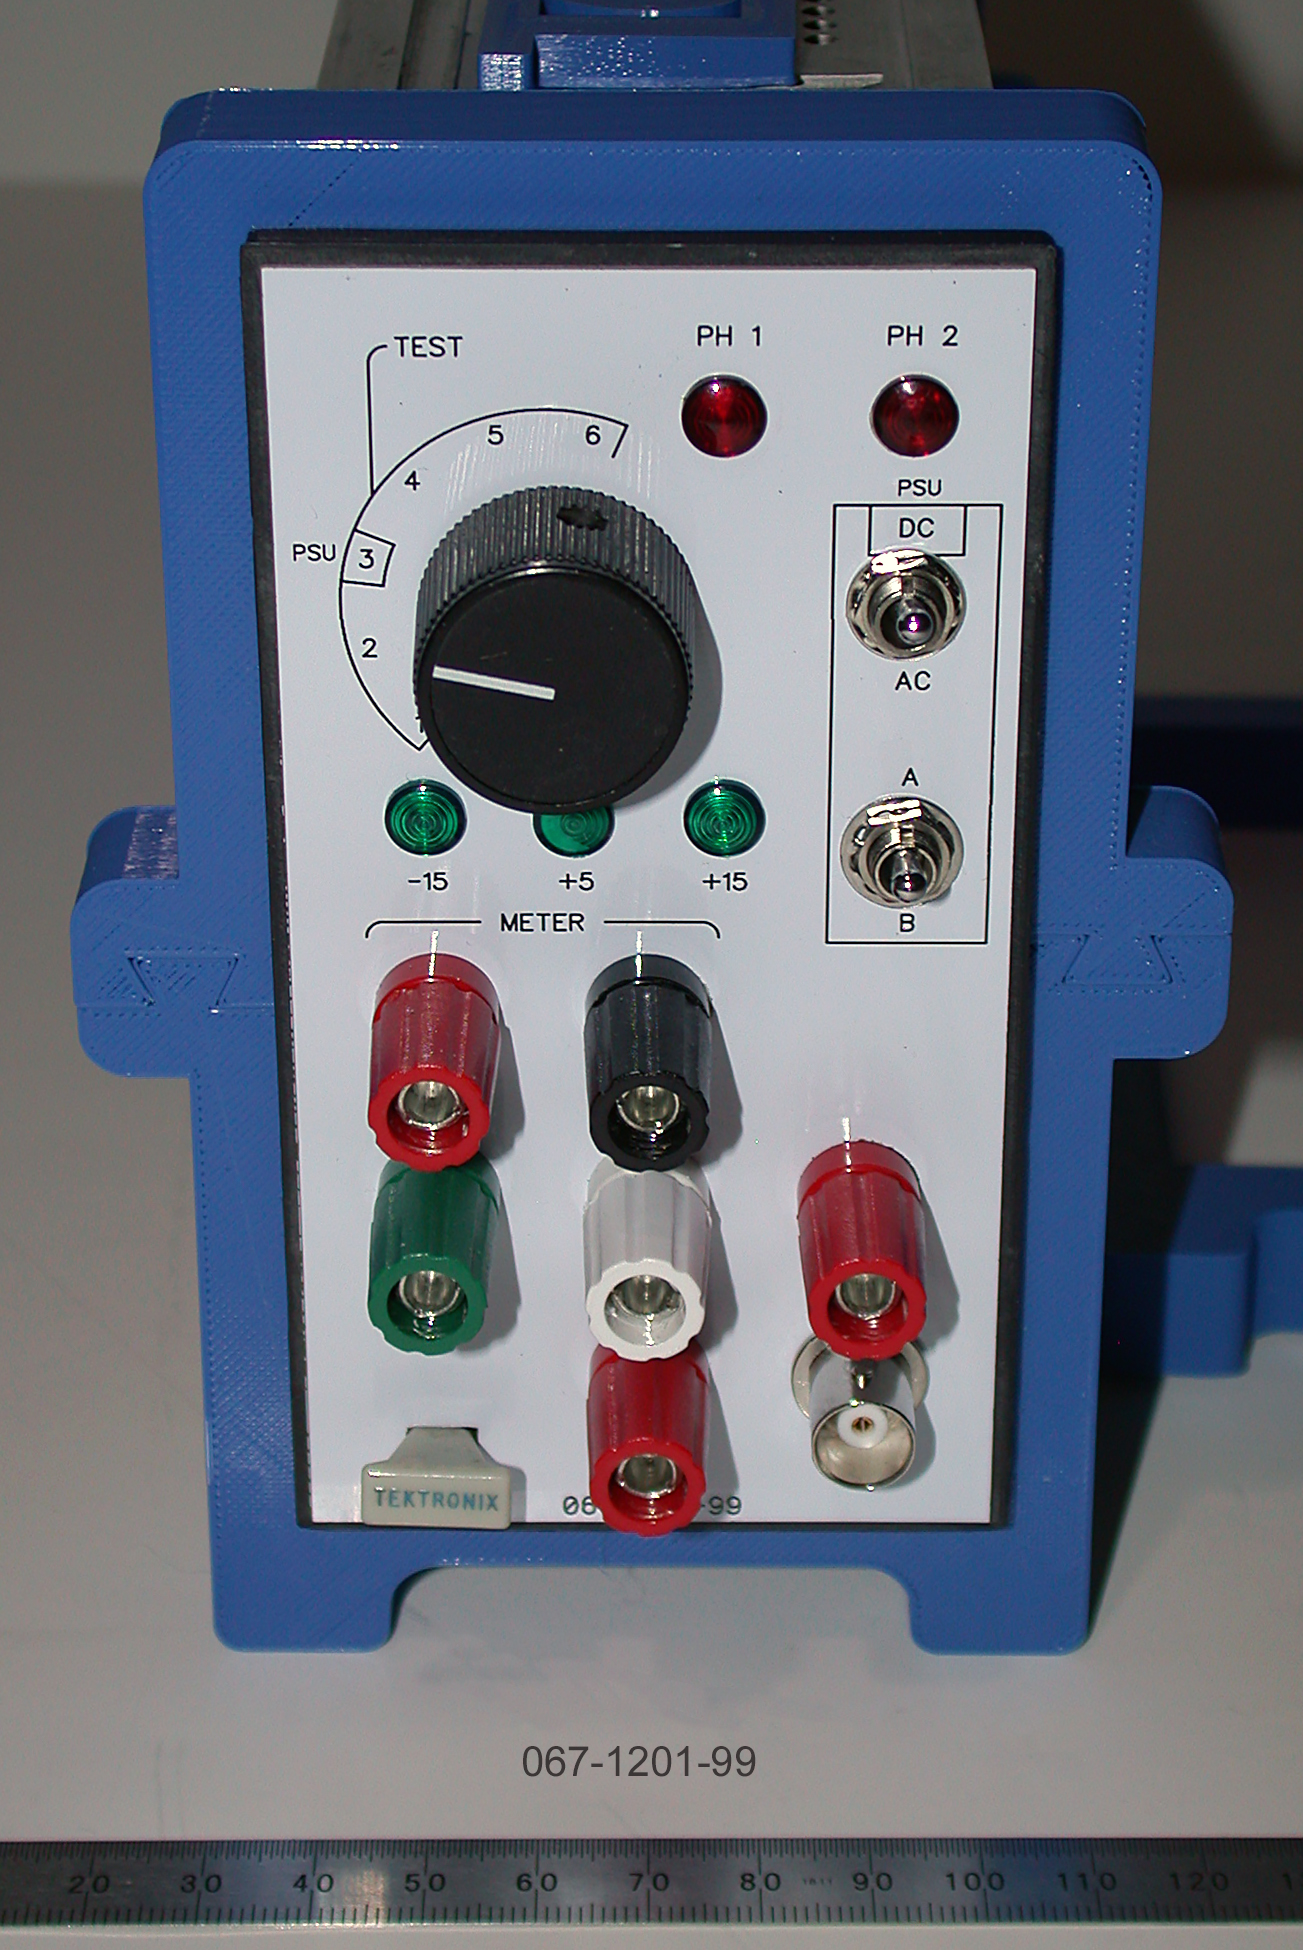 Tektronix TM500 Power Frame Tester